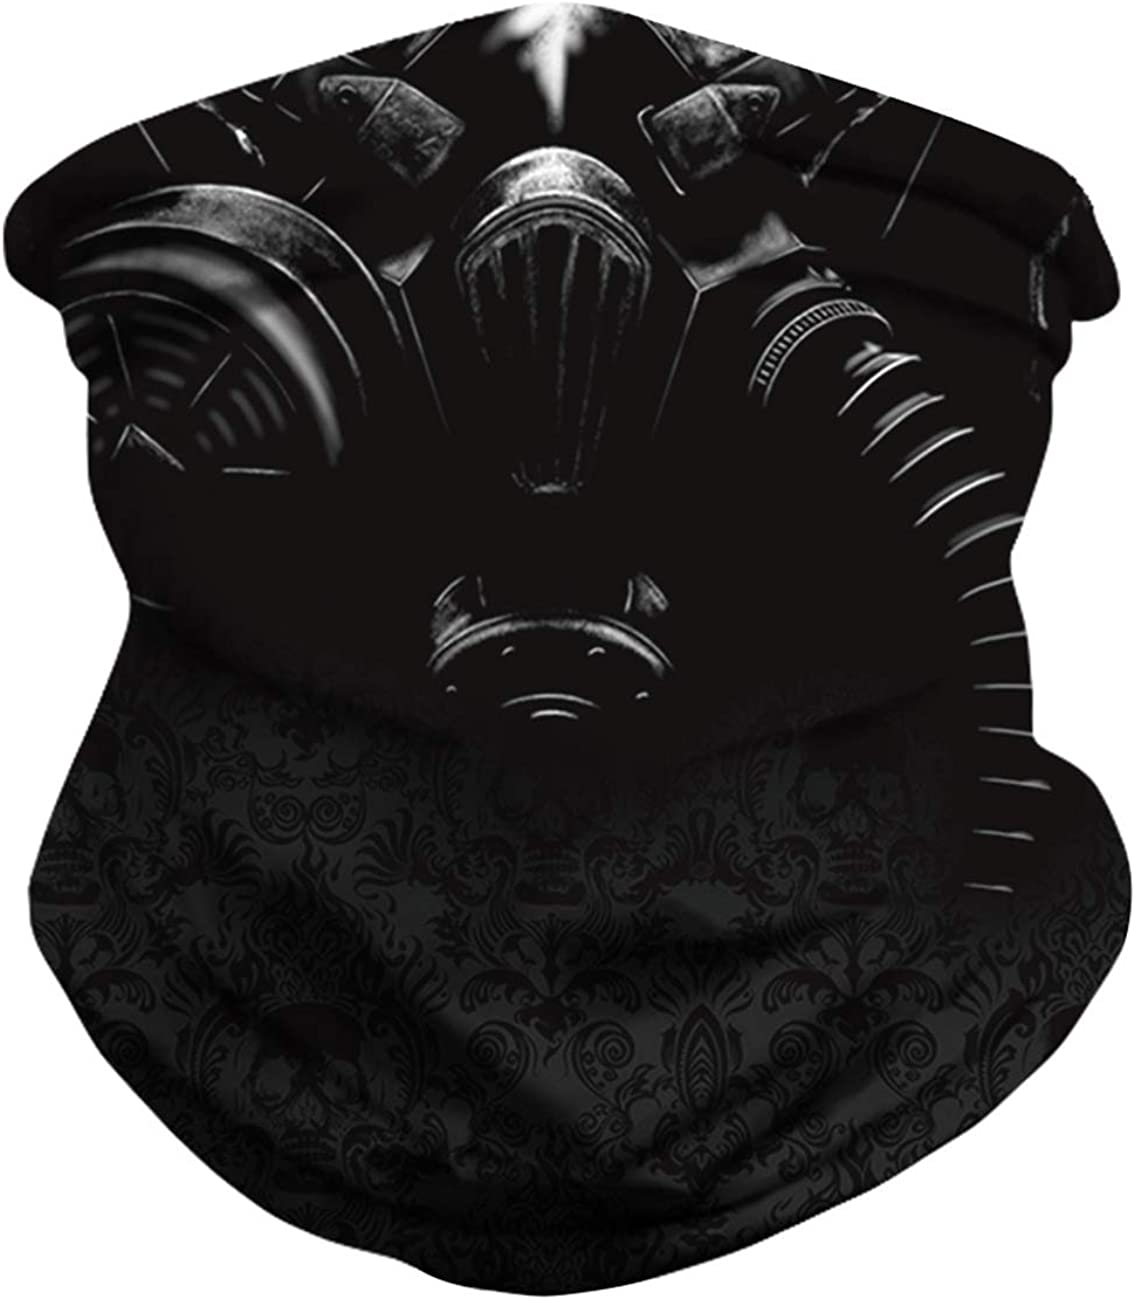 Ecosunny Face Mask Bandanas Scarf UV Protection Neck Gaiter Headwear Balaclava for Women & Men Dust Outdoors/Sports